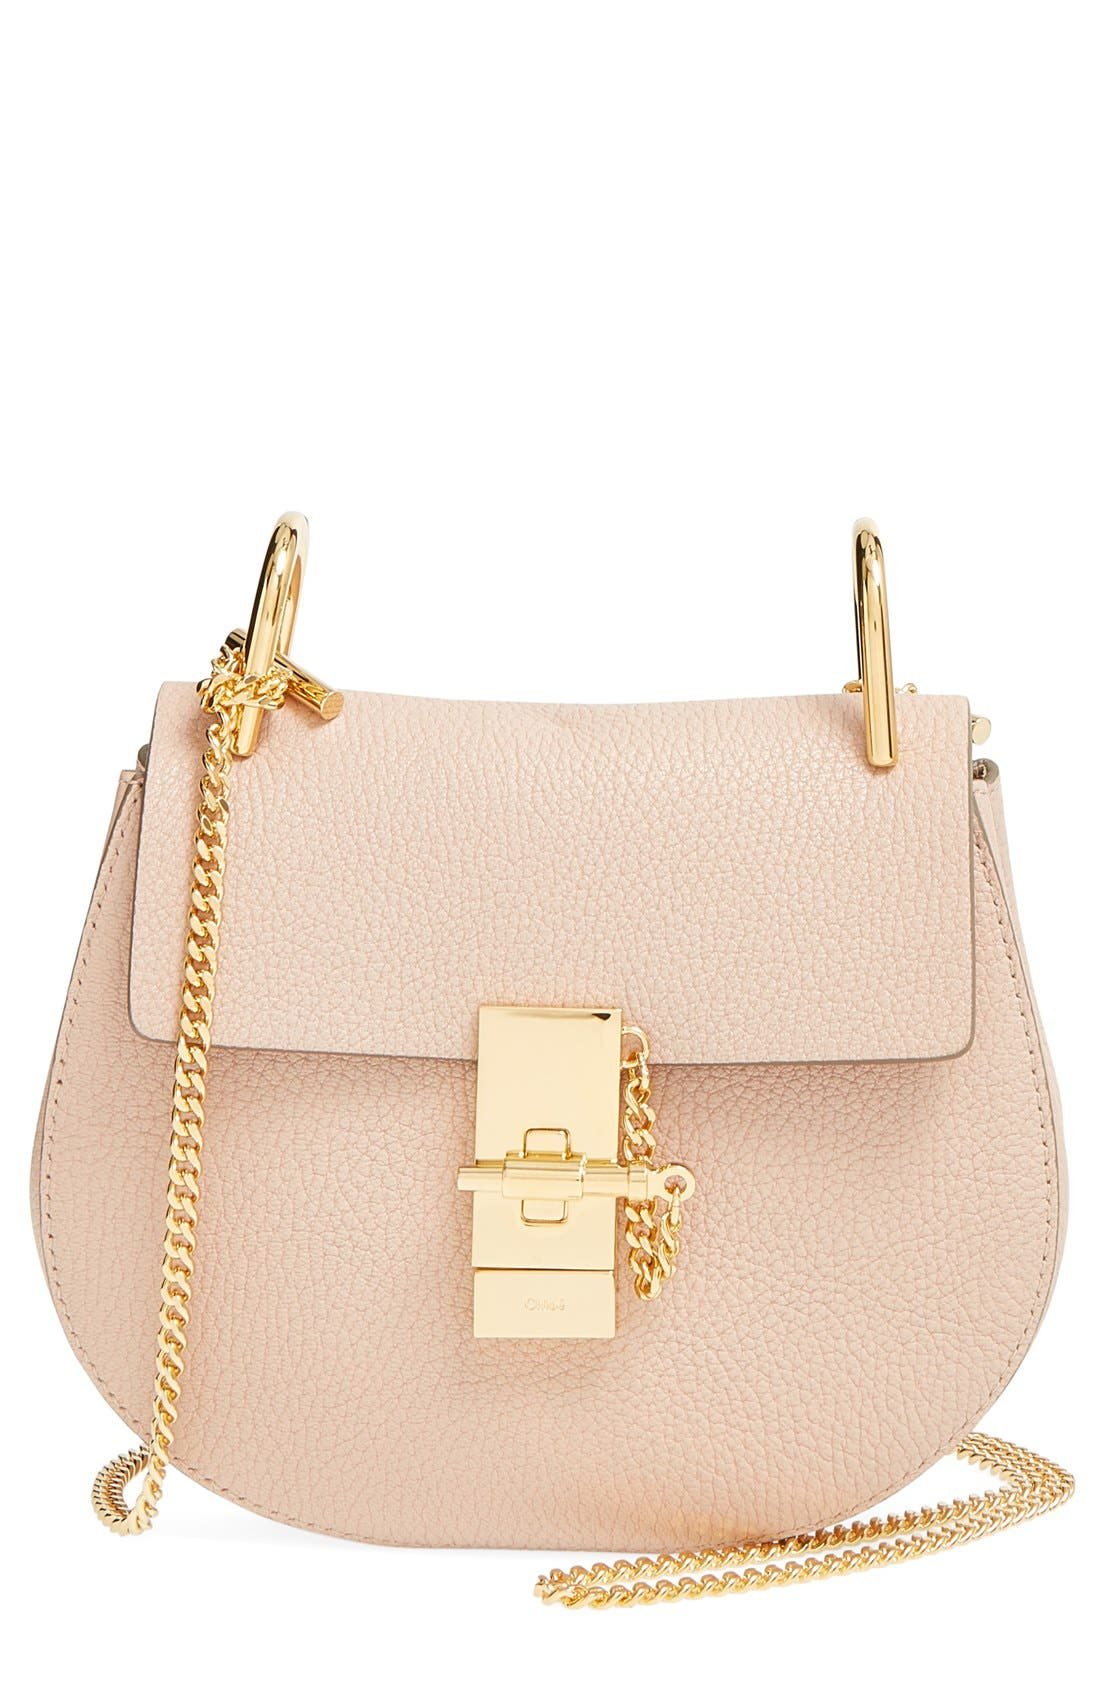 CHLOÉ Mini Drew Leather Shoulder Bag